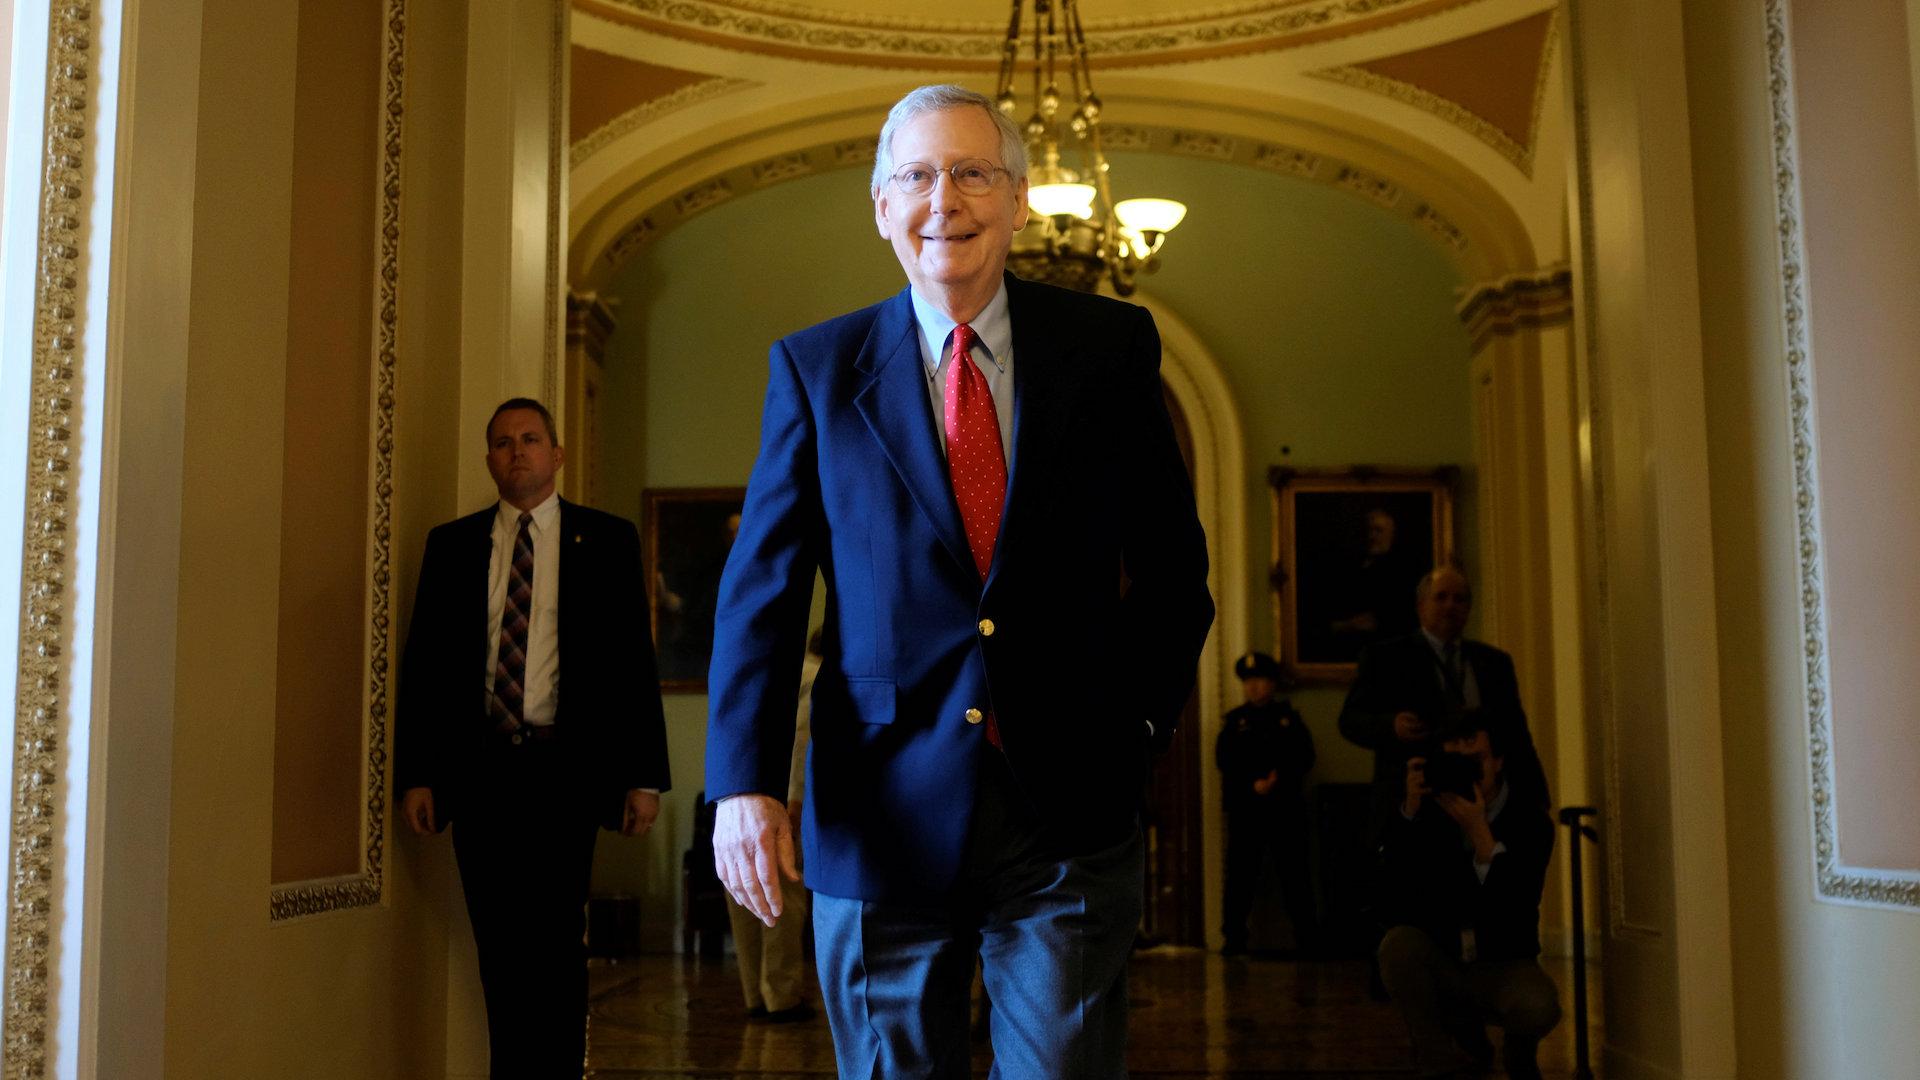 Hours after Senate GOP passes tax bill, Trump says he'll consider raising corporate rate